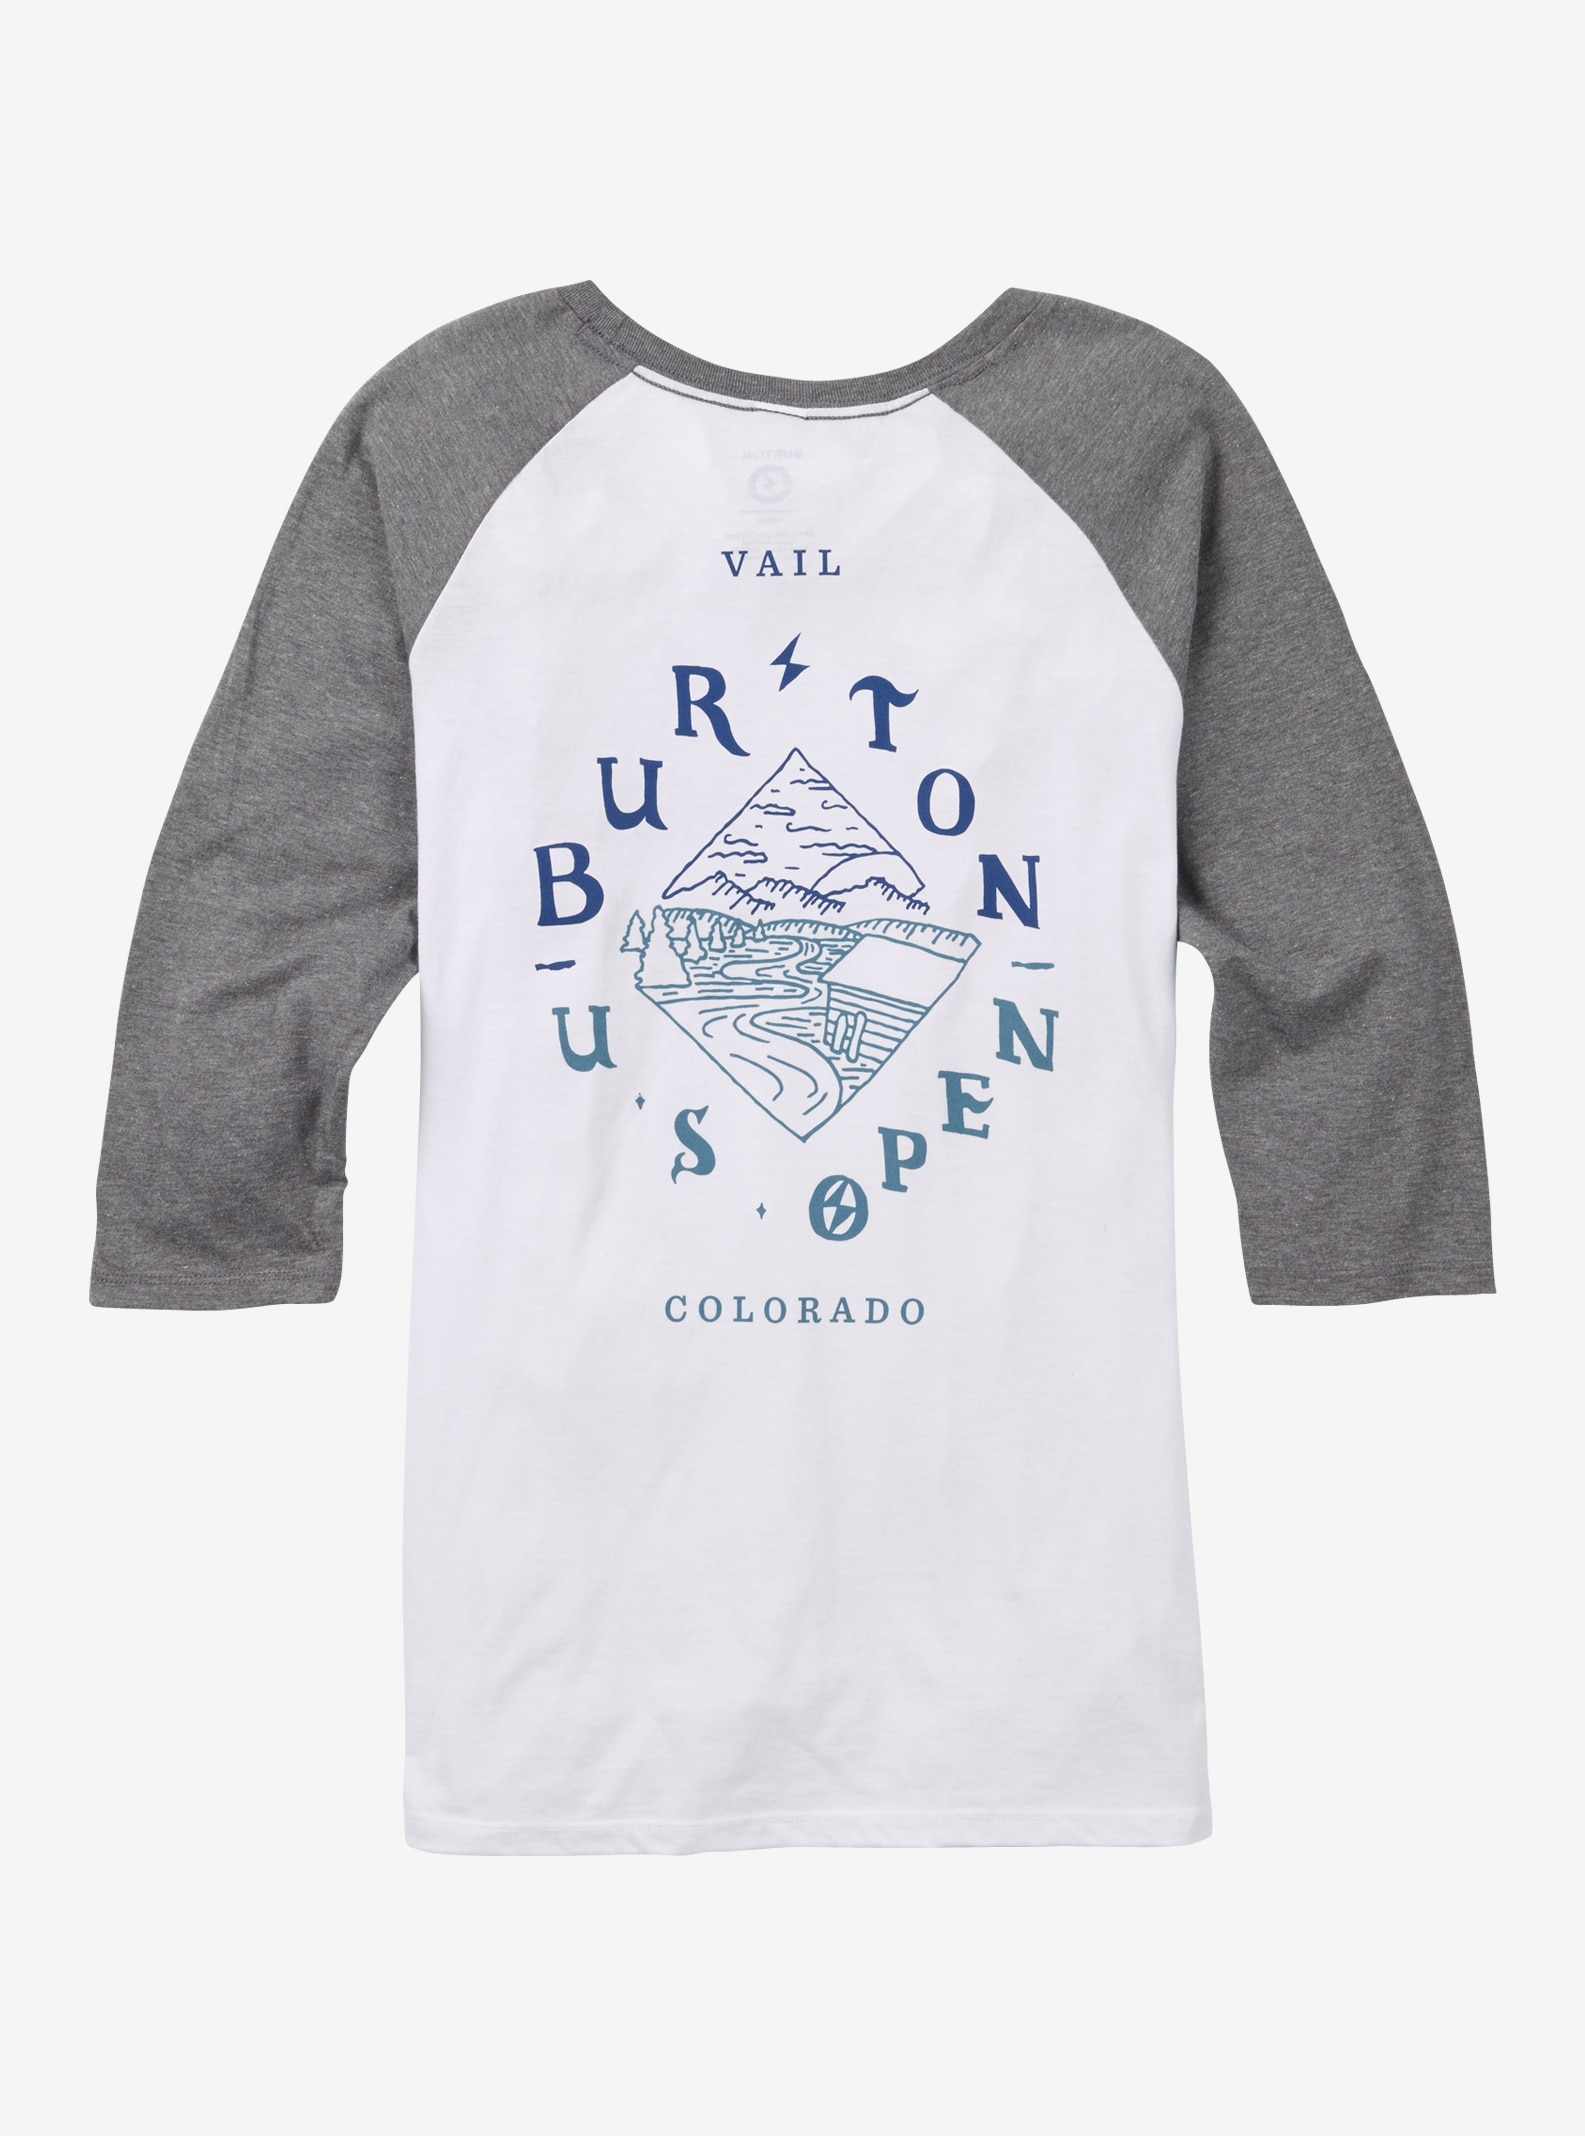 Burton US Open Raglan Tee shown in Gray Frost / White